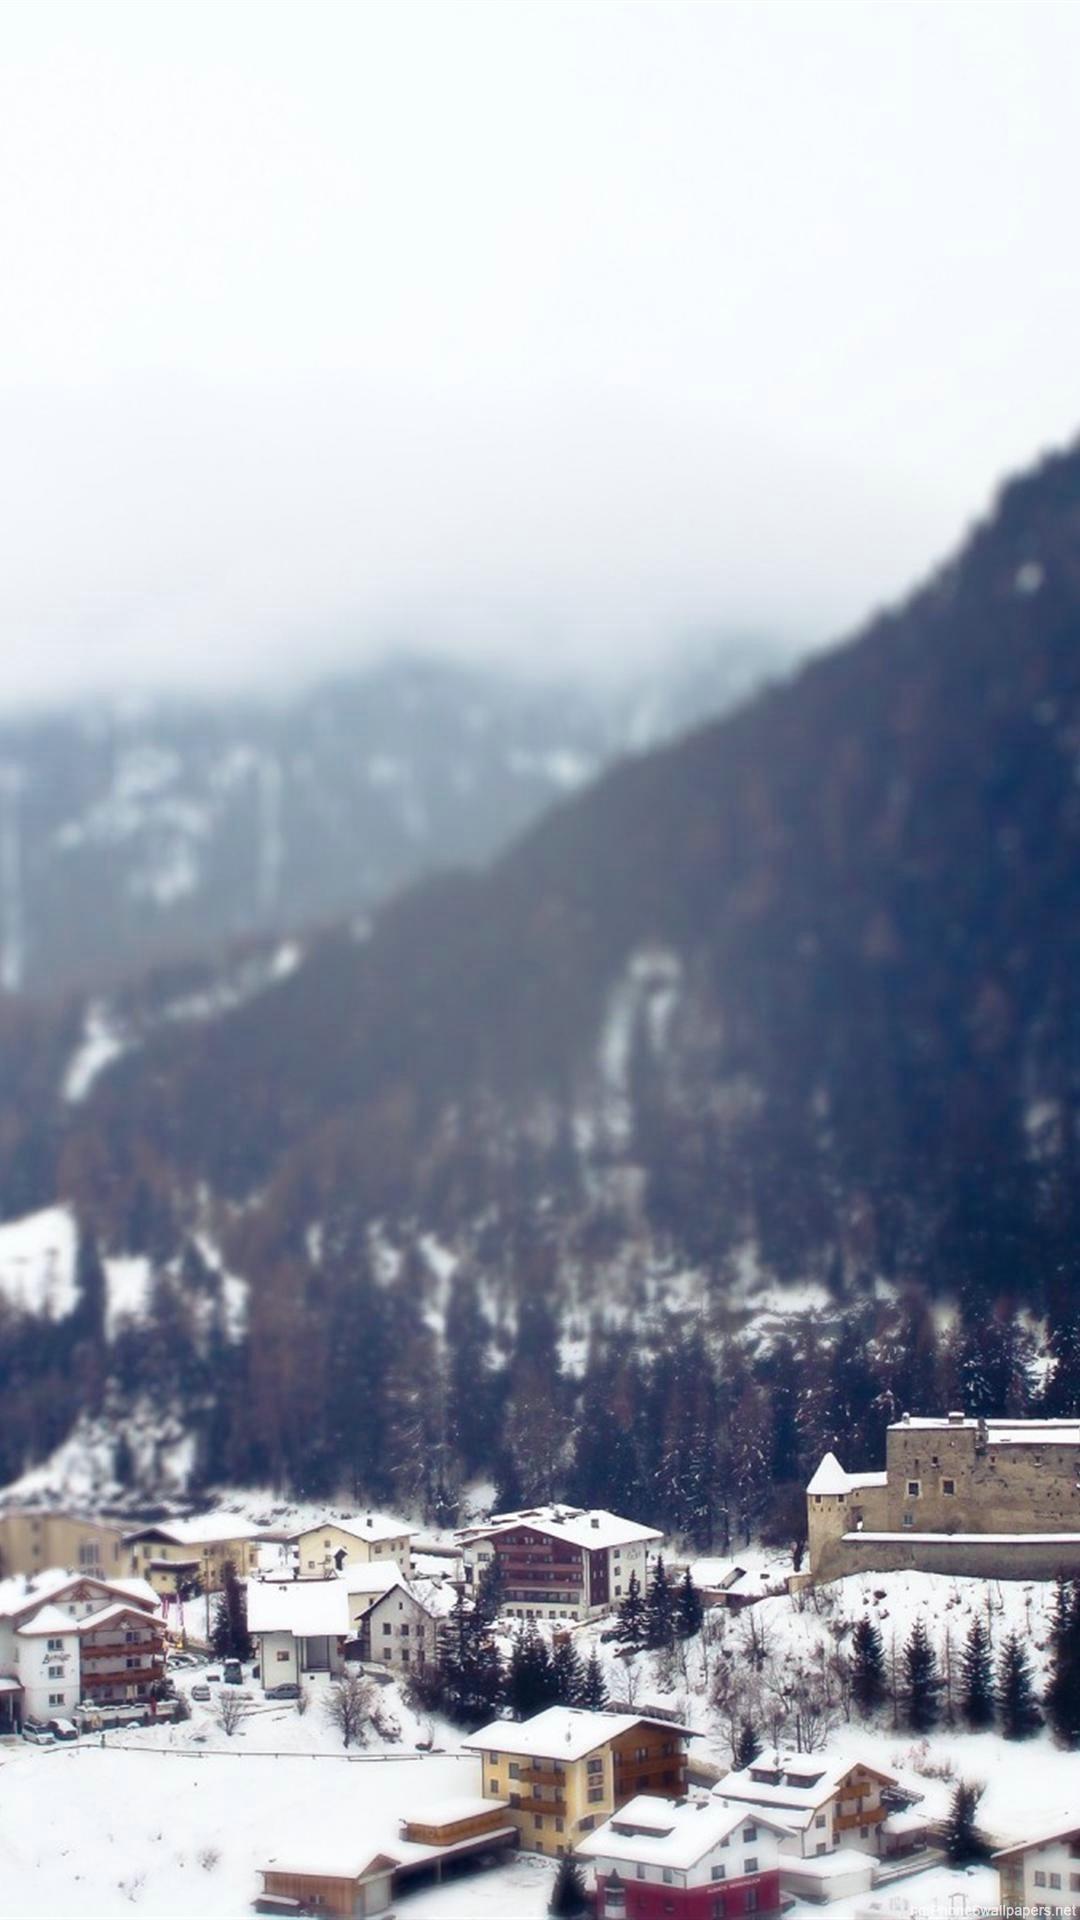 HD travel mountain winter snow iphone 6 wallpaper